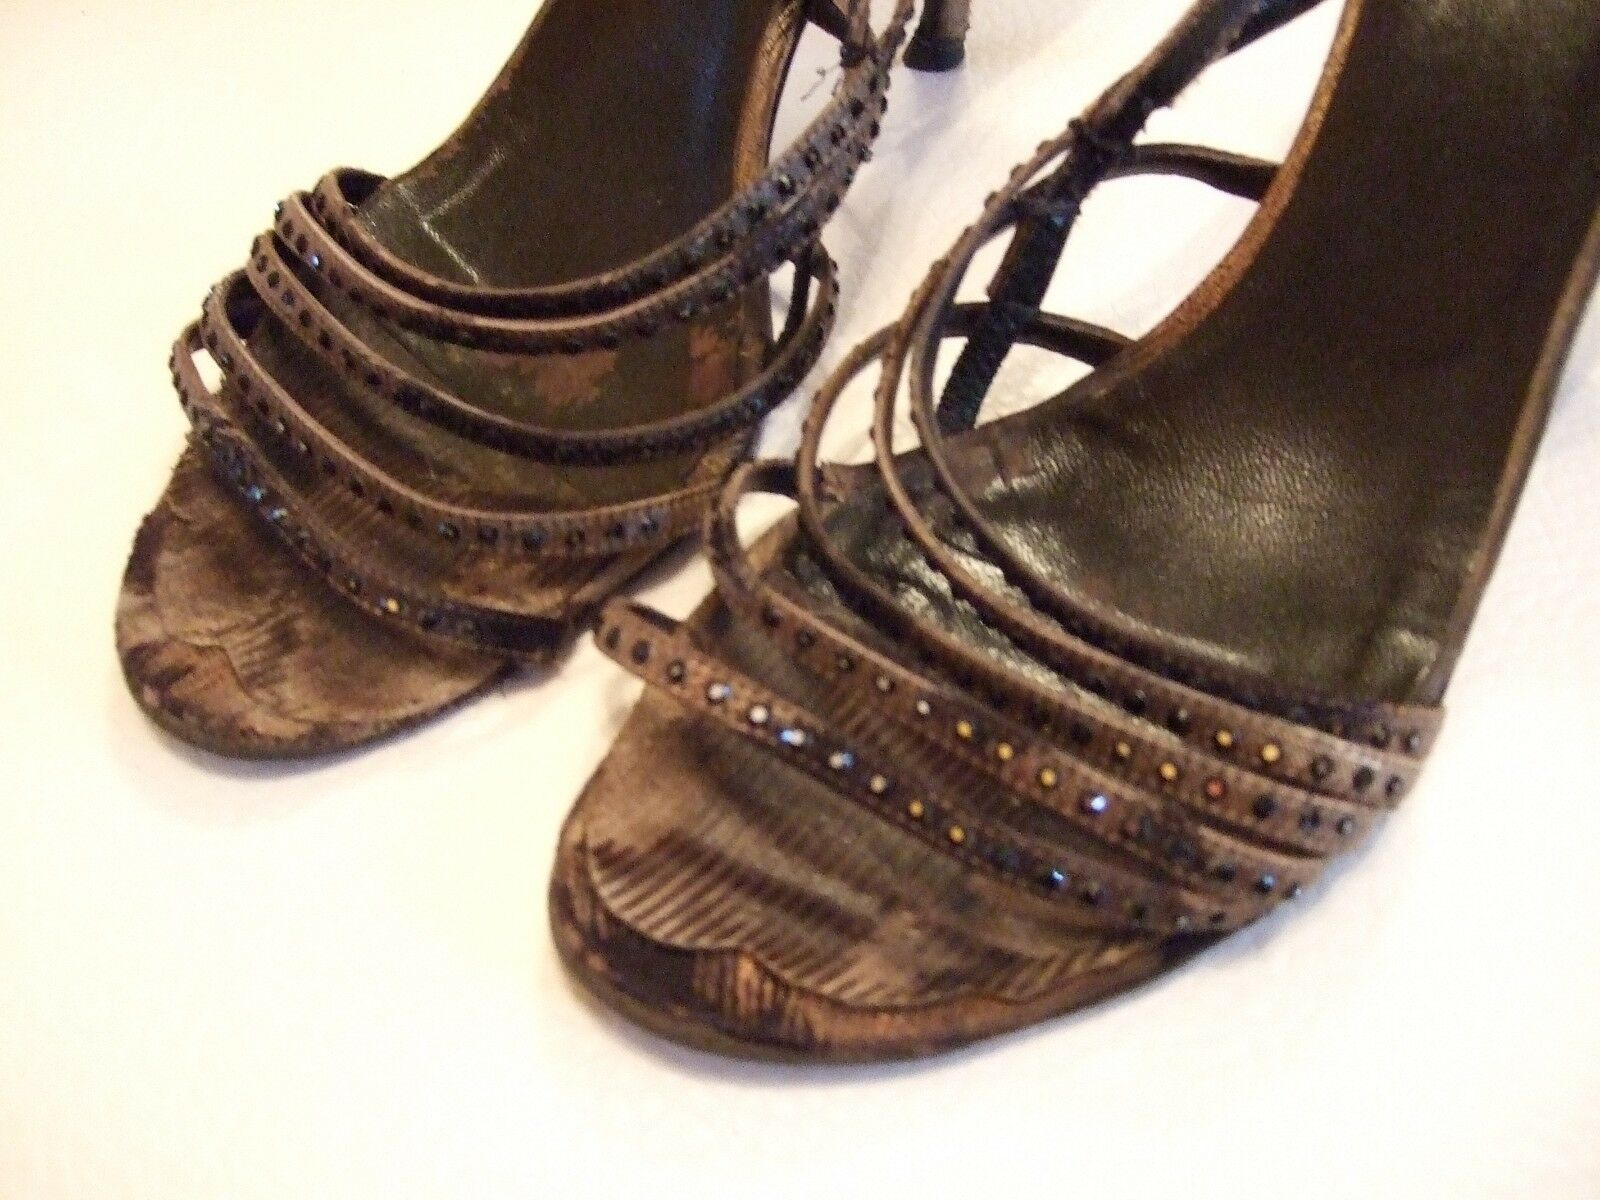 Valentino Damenschuhe Größe 39,5 Farbe Bronze-Khaki